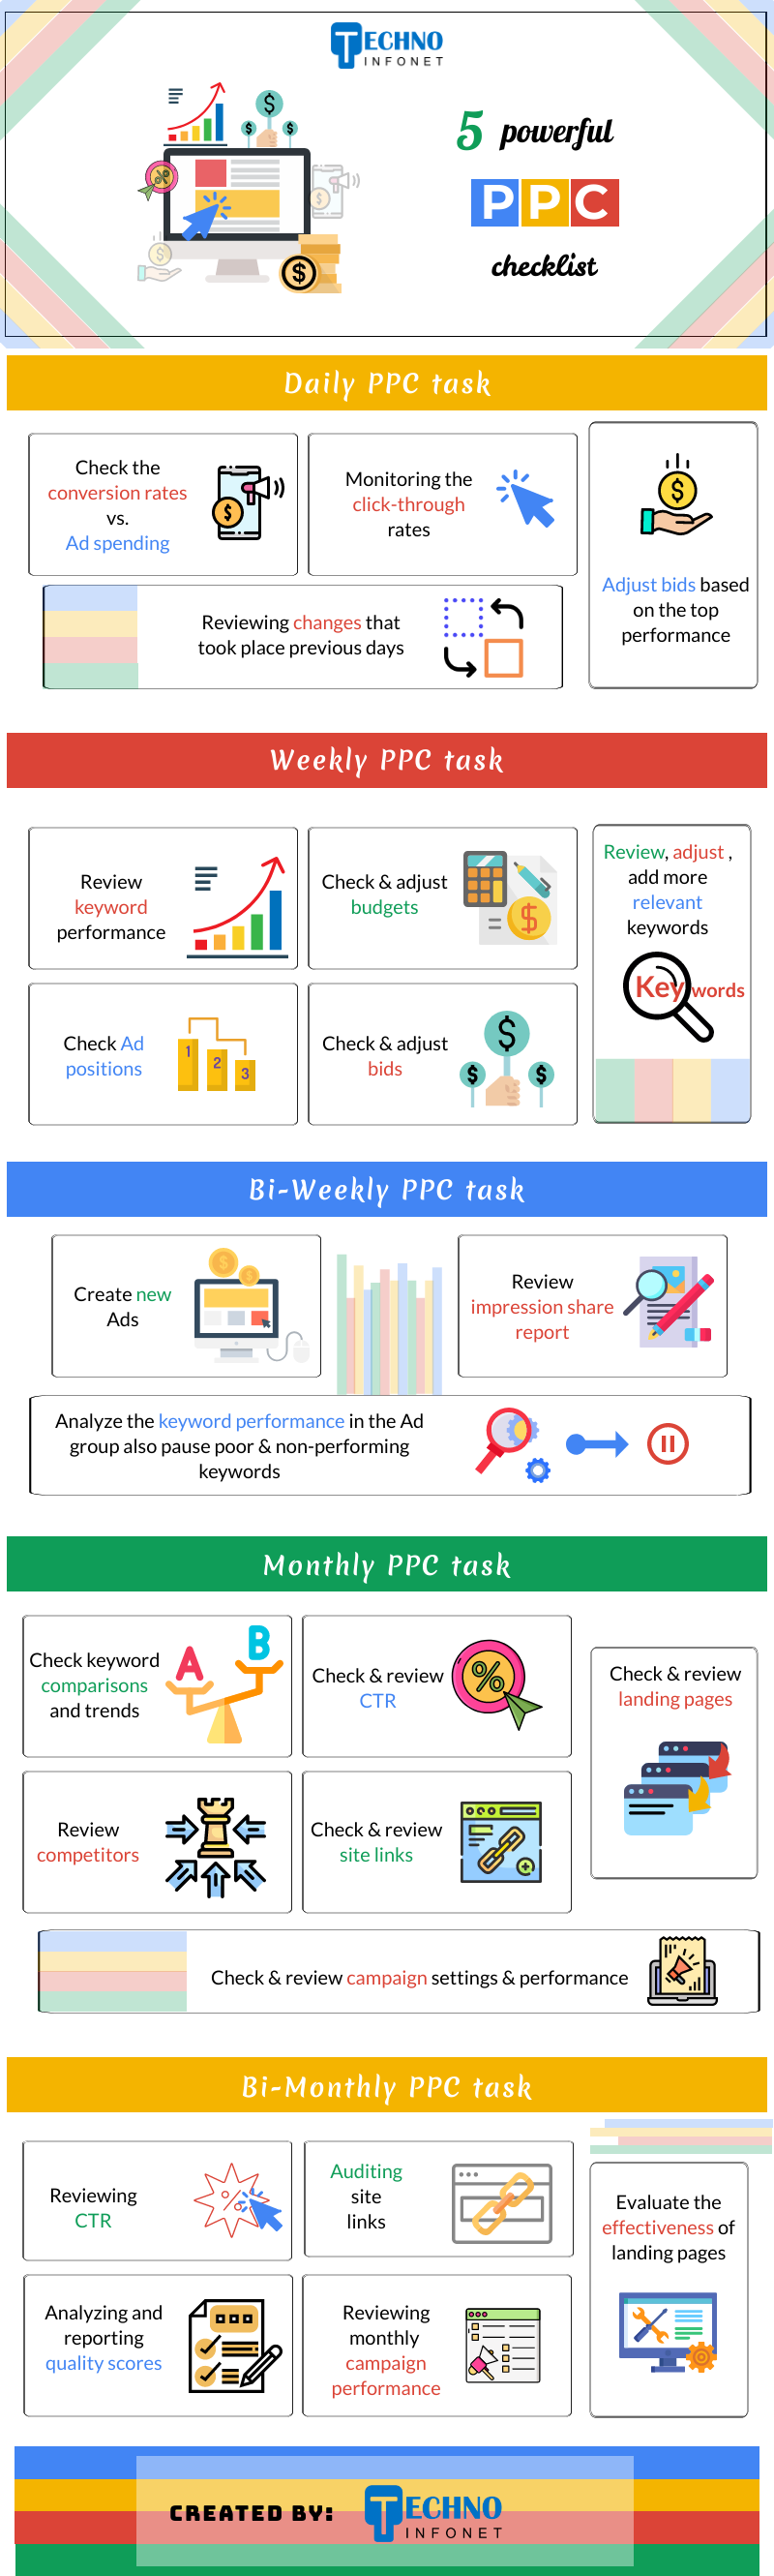 5 powerful PPC checklist